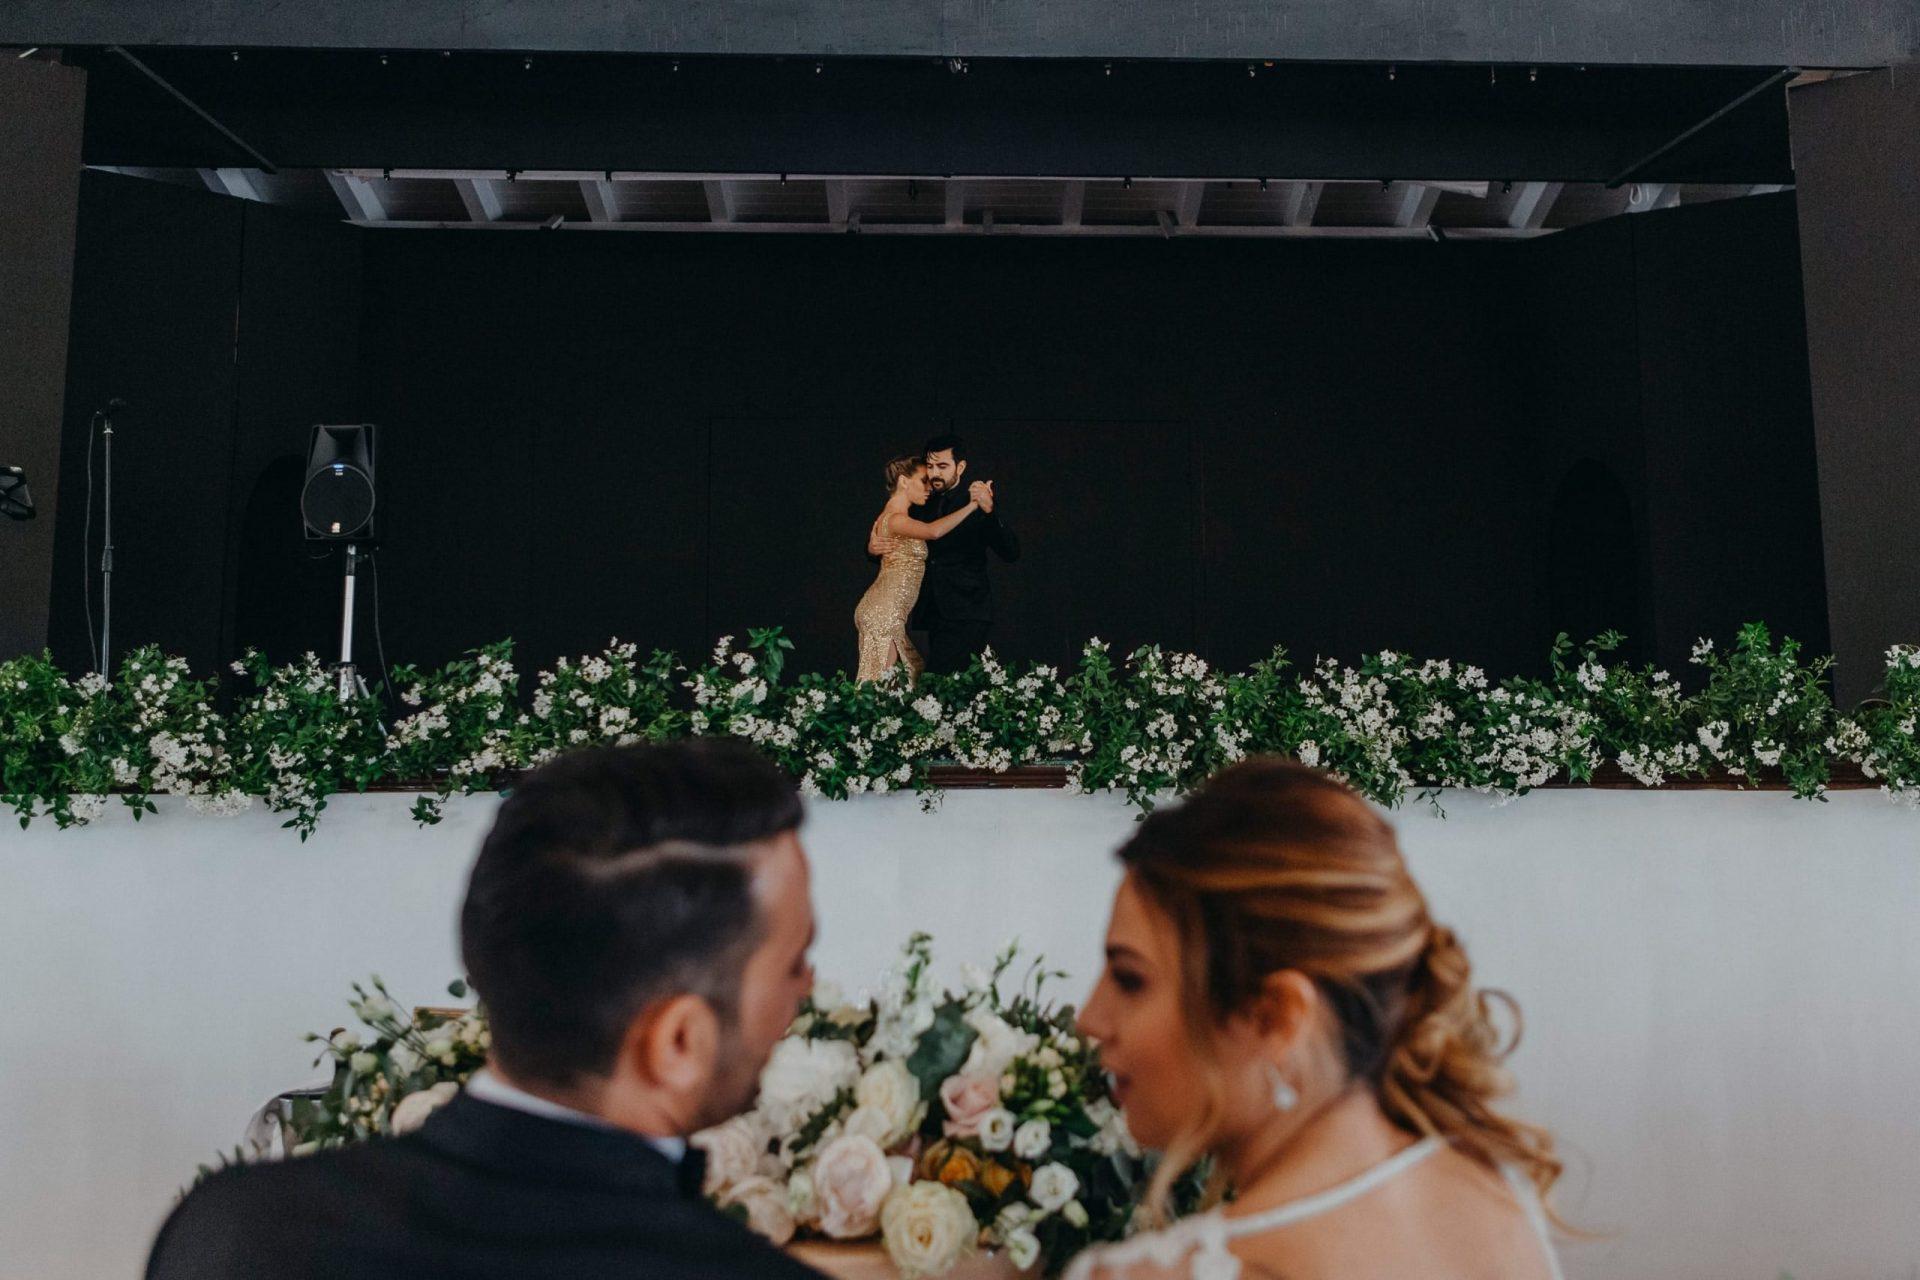 Giacomo and Federica, tango dancers